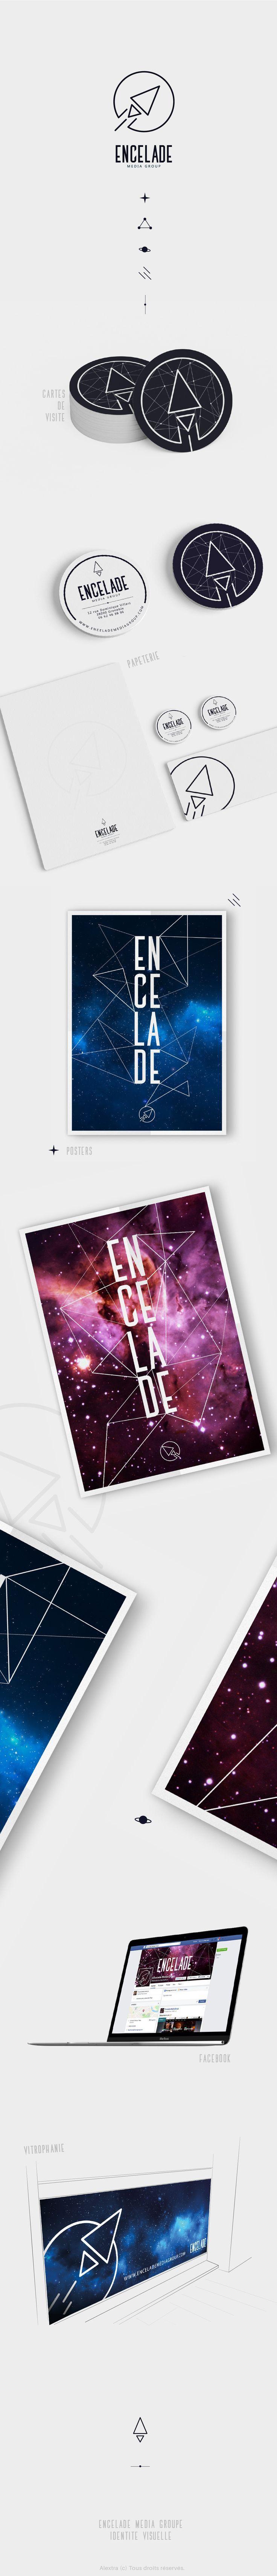 Encelade Media Group | Alextra Visual Identity - Graphisme - Designer - Design - Infographie - identité visuelle - Logo - Logotype - Galaxy - Planète - Cosmos - Fusée